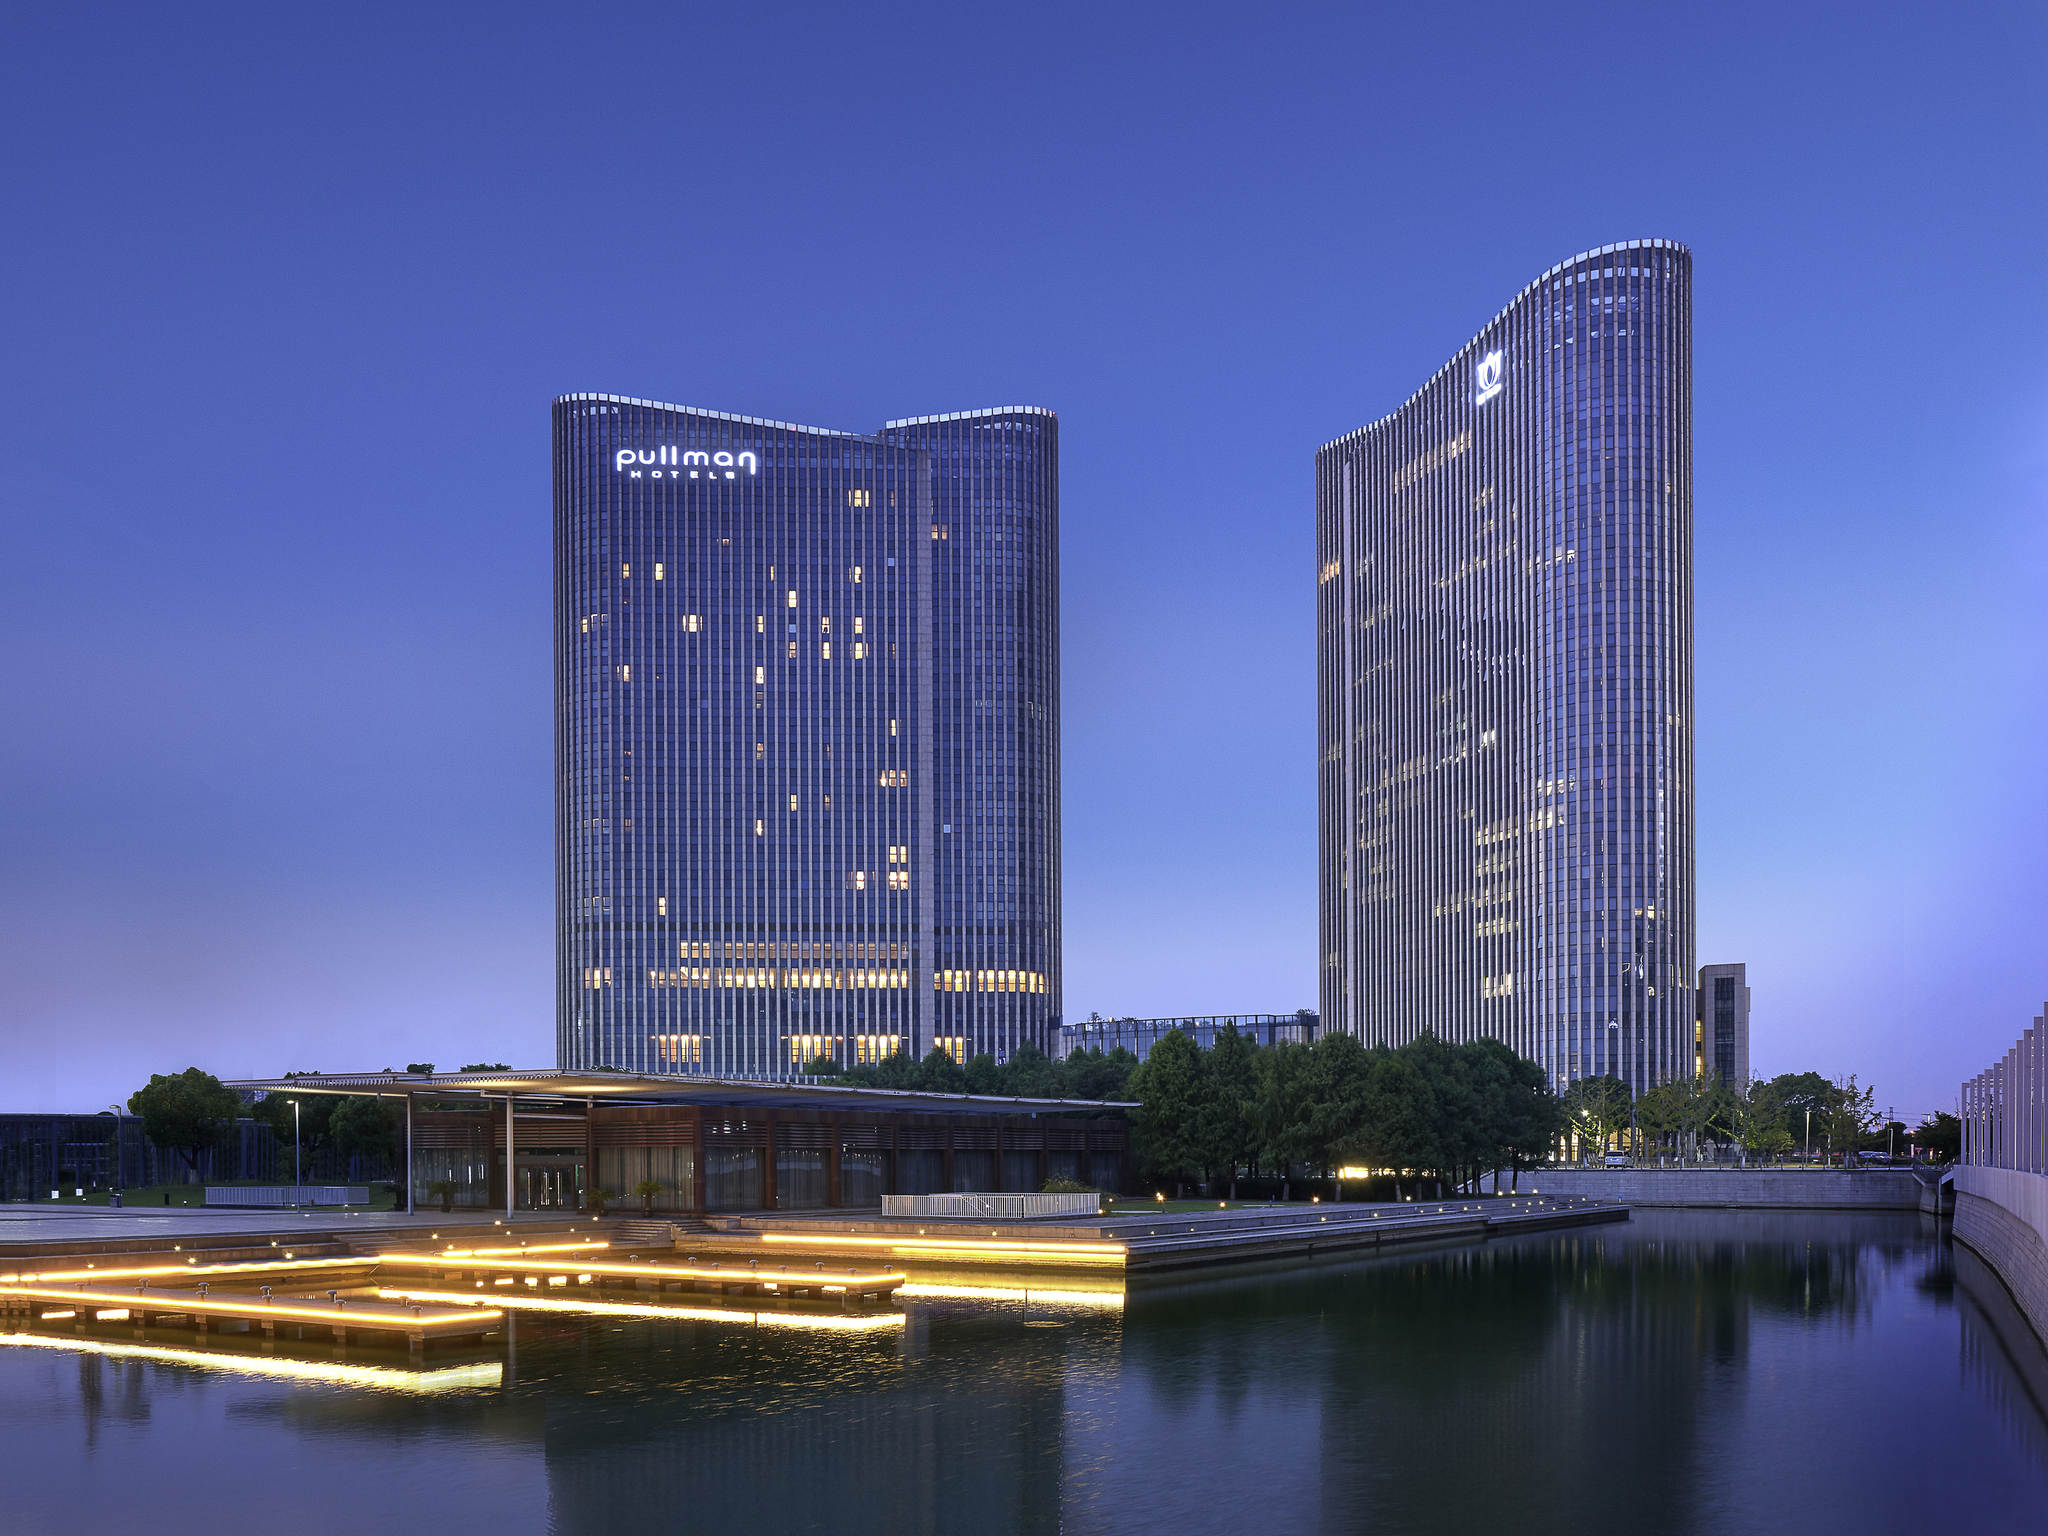 Hotel - Pullman Wuxi New Lake